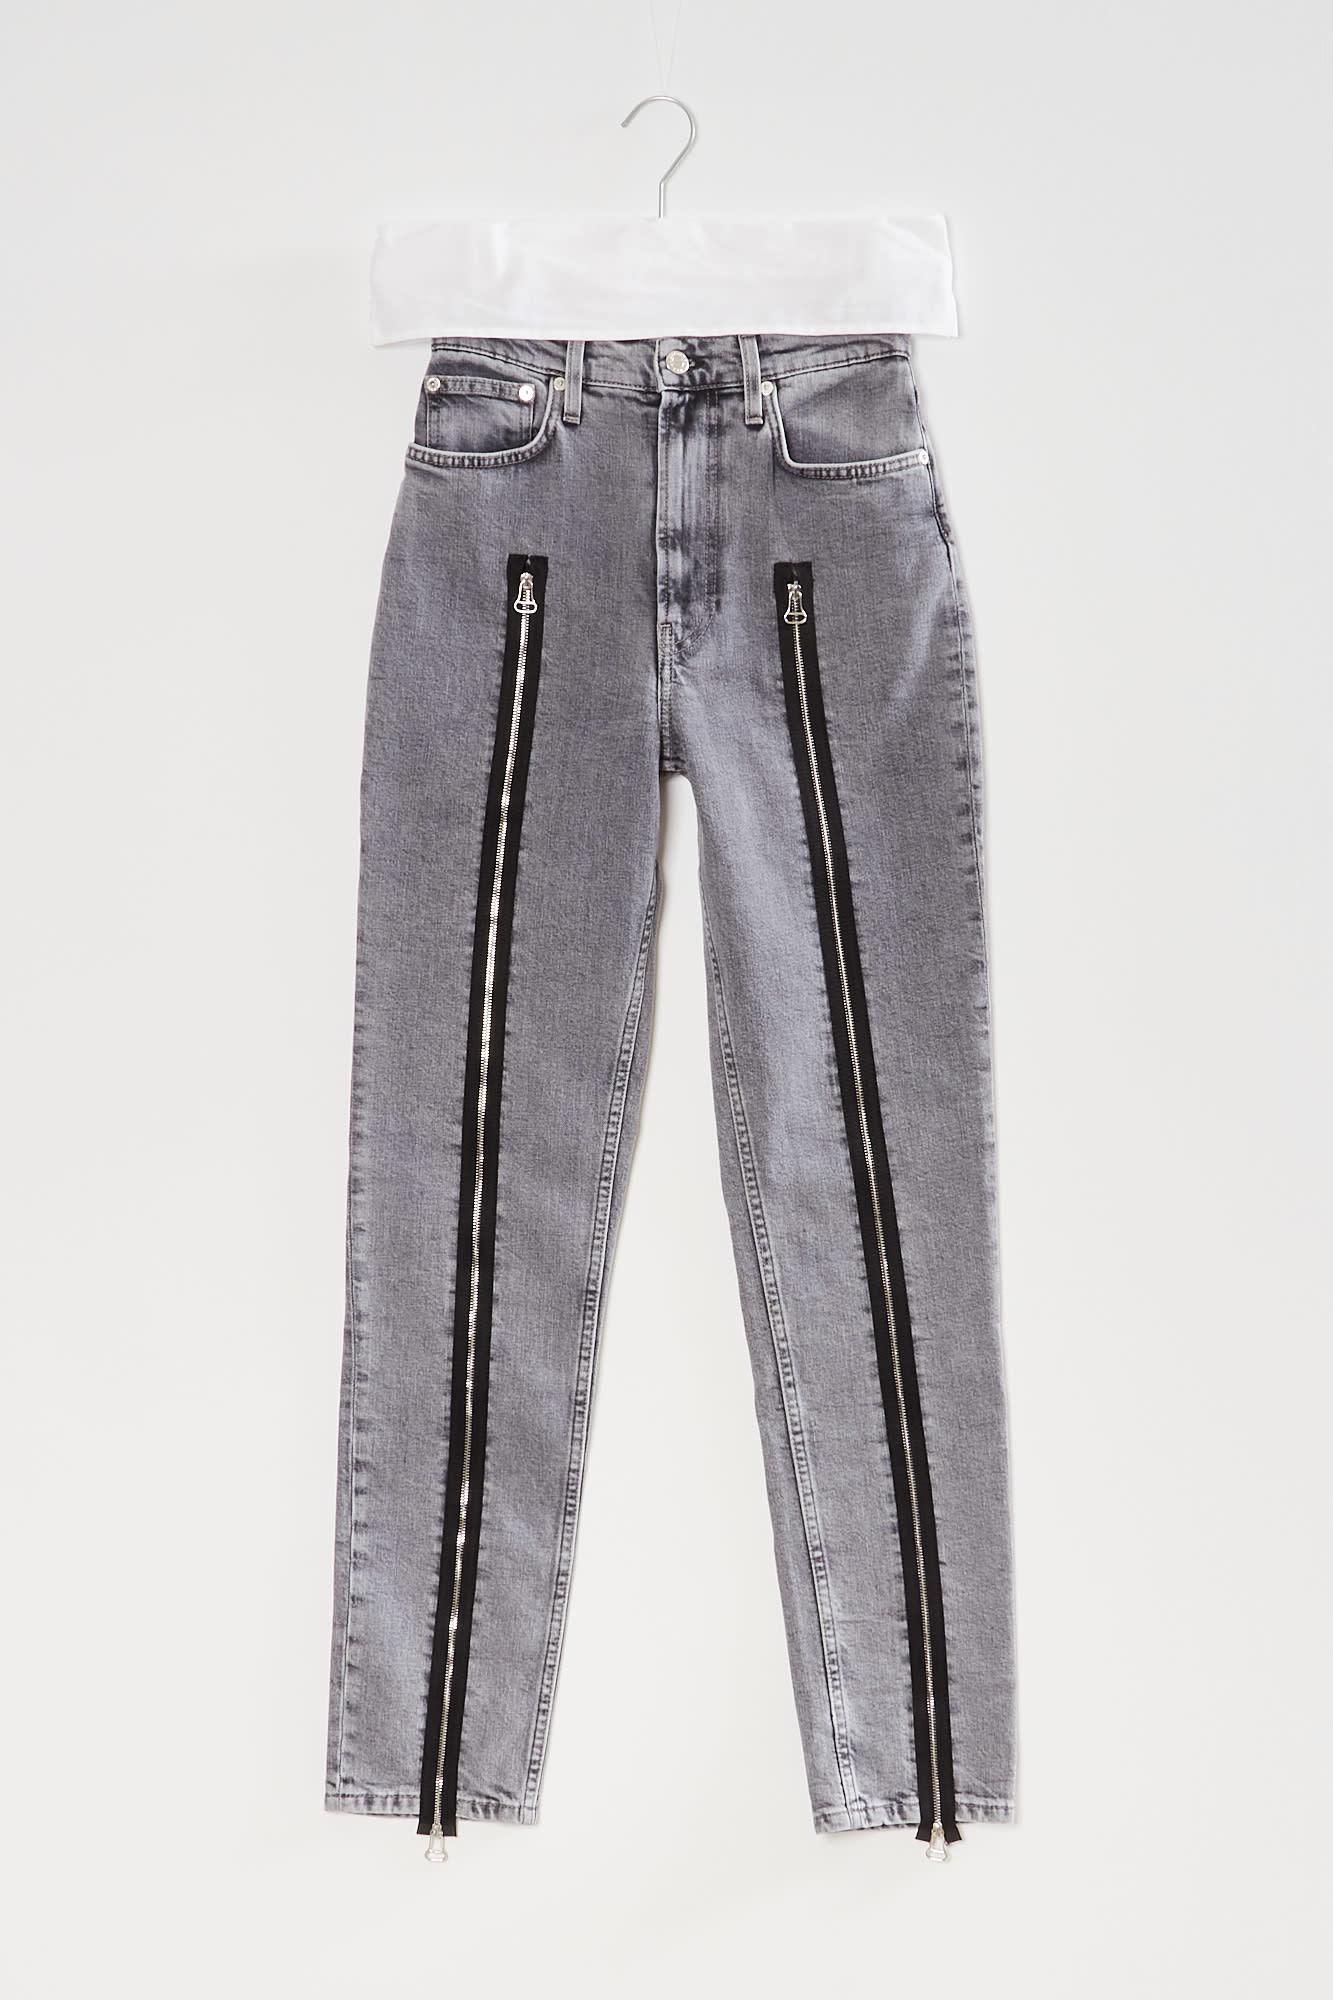 Helmut Lang - femme hi spikes jeans stone